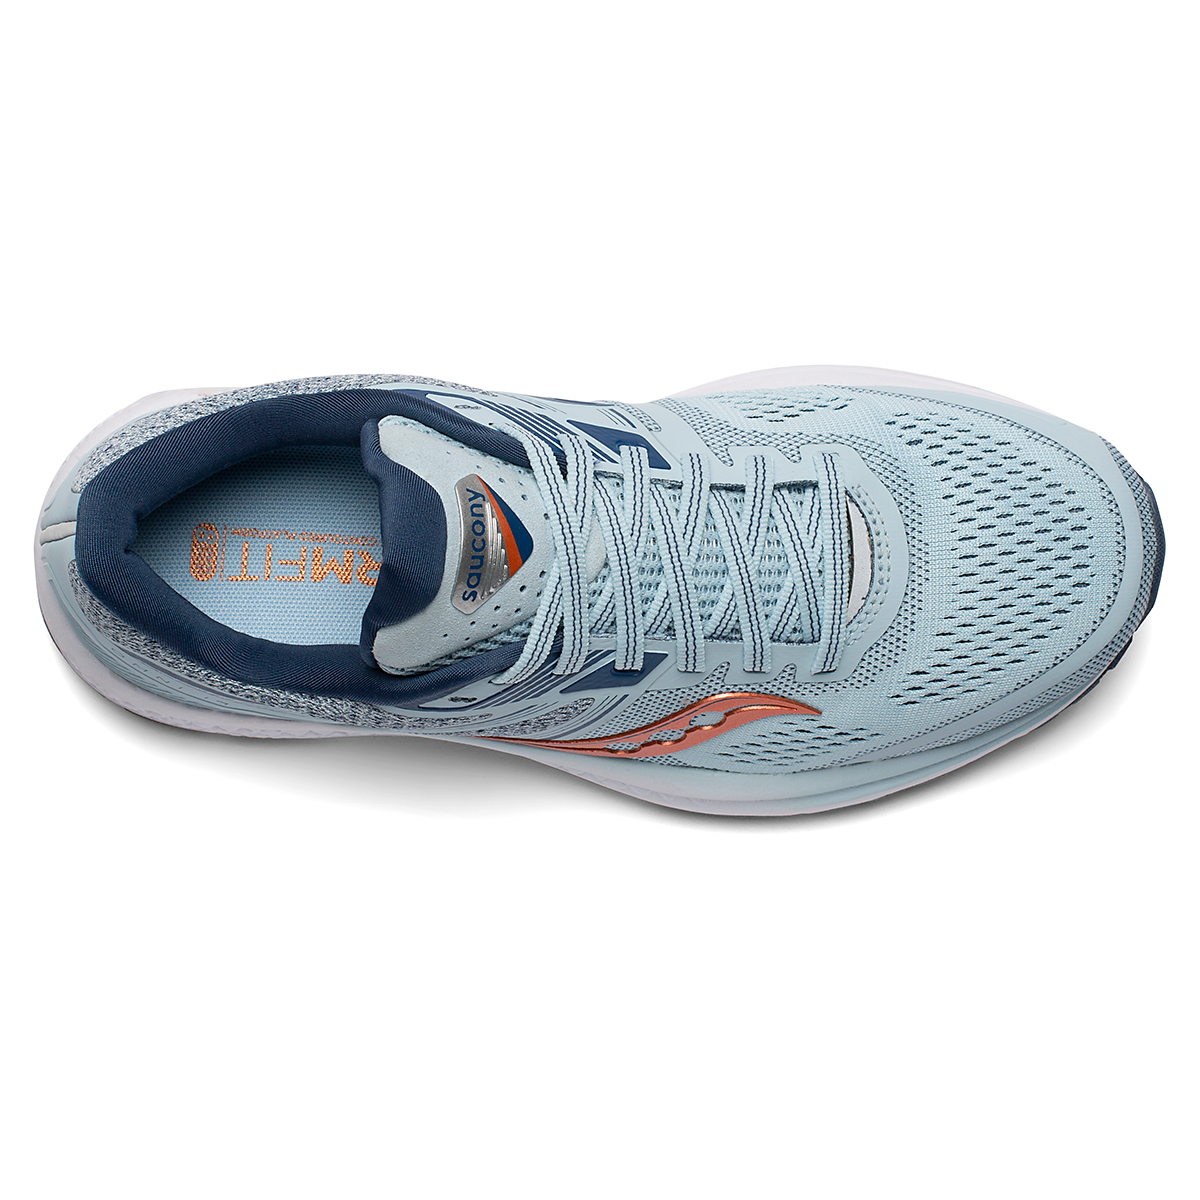 Women's Saucony Omni 19 Running Shoe - Color: Sky/Storm - Size: 5 - Width: Regular, Sky/Storm, large, image 4